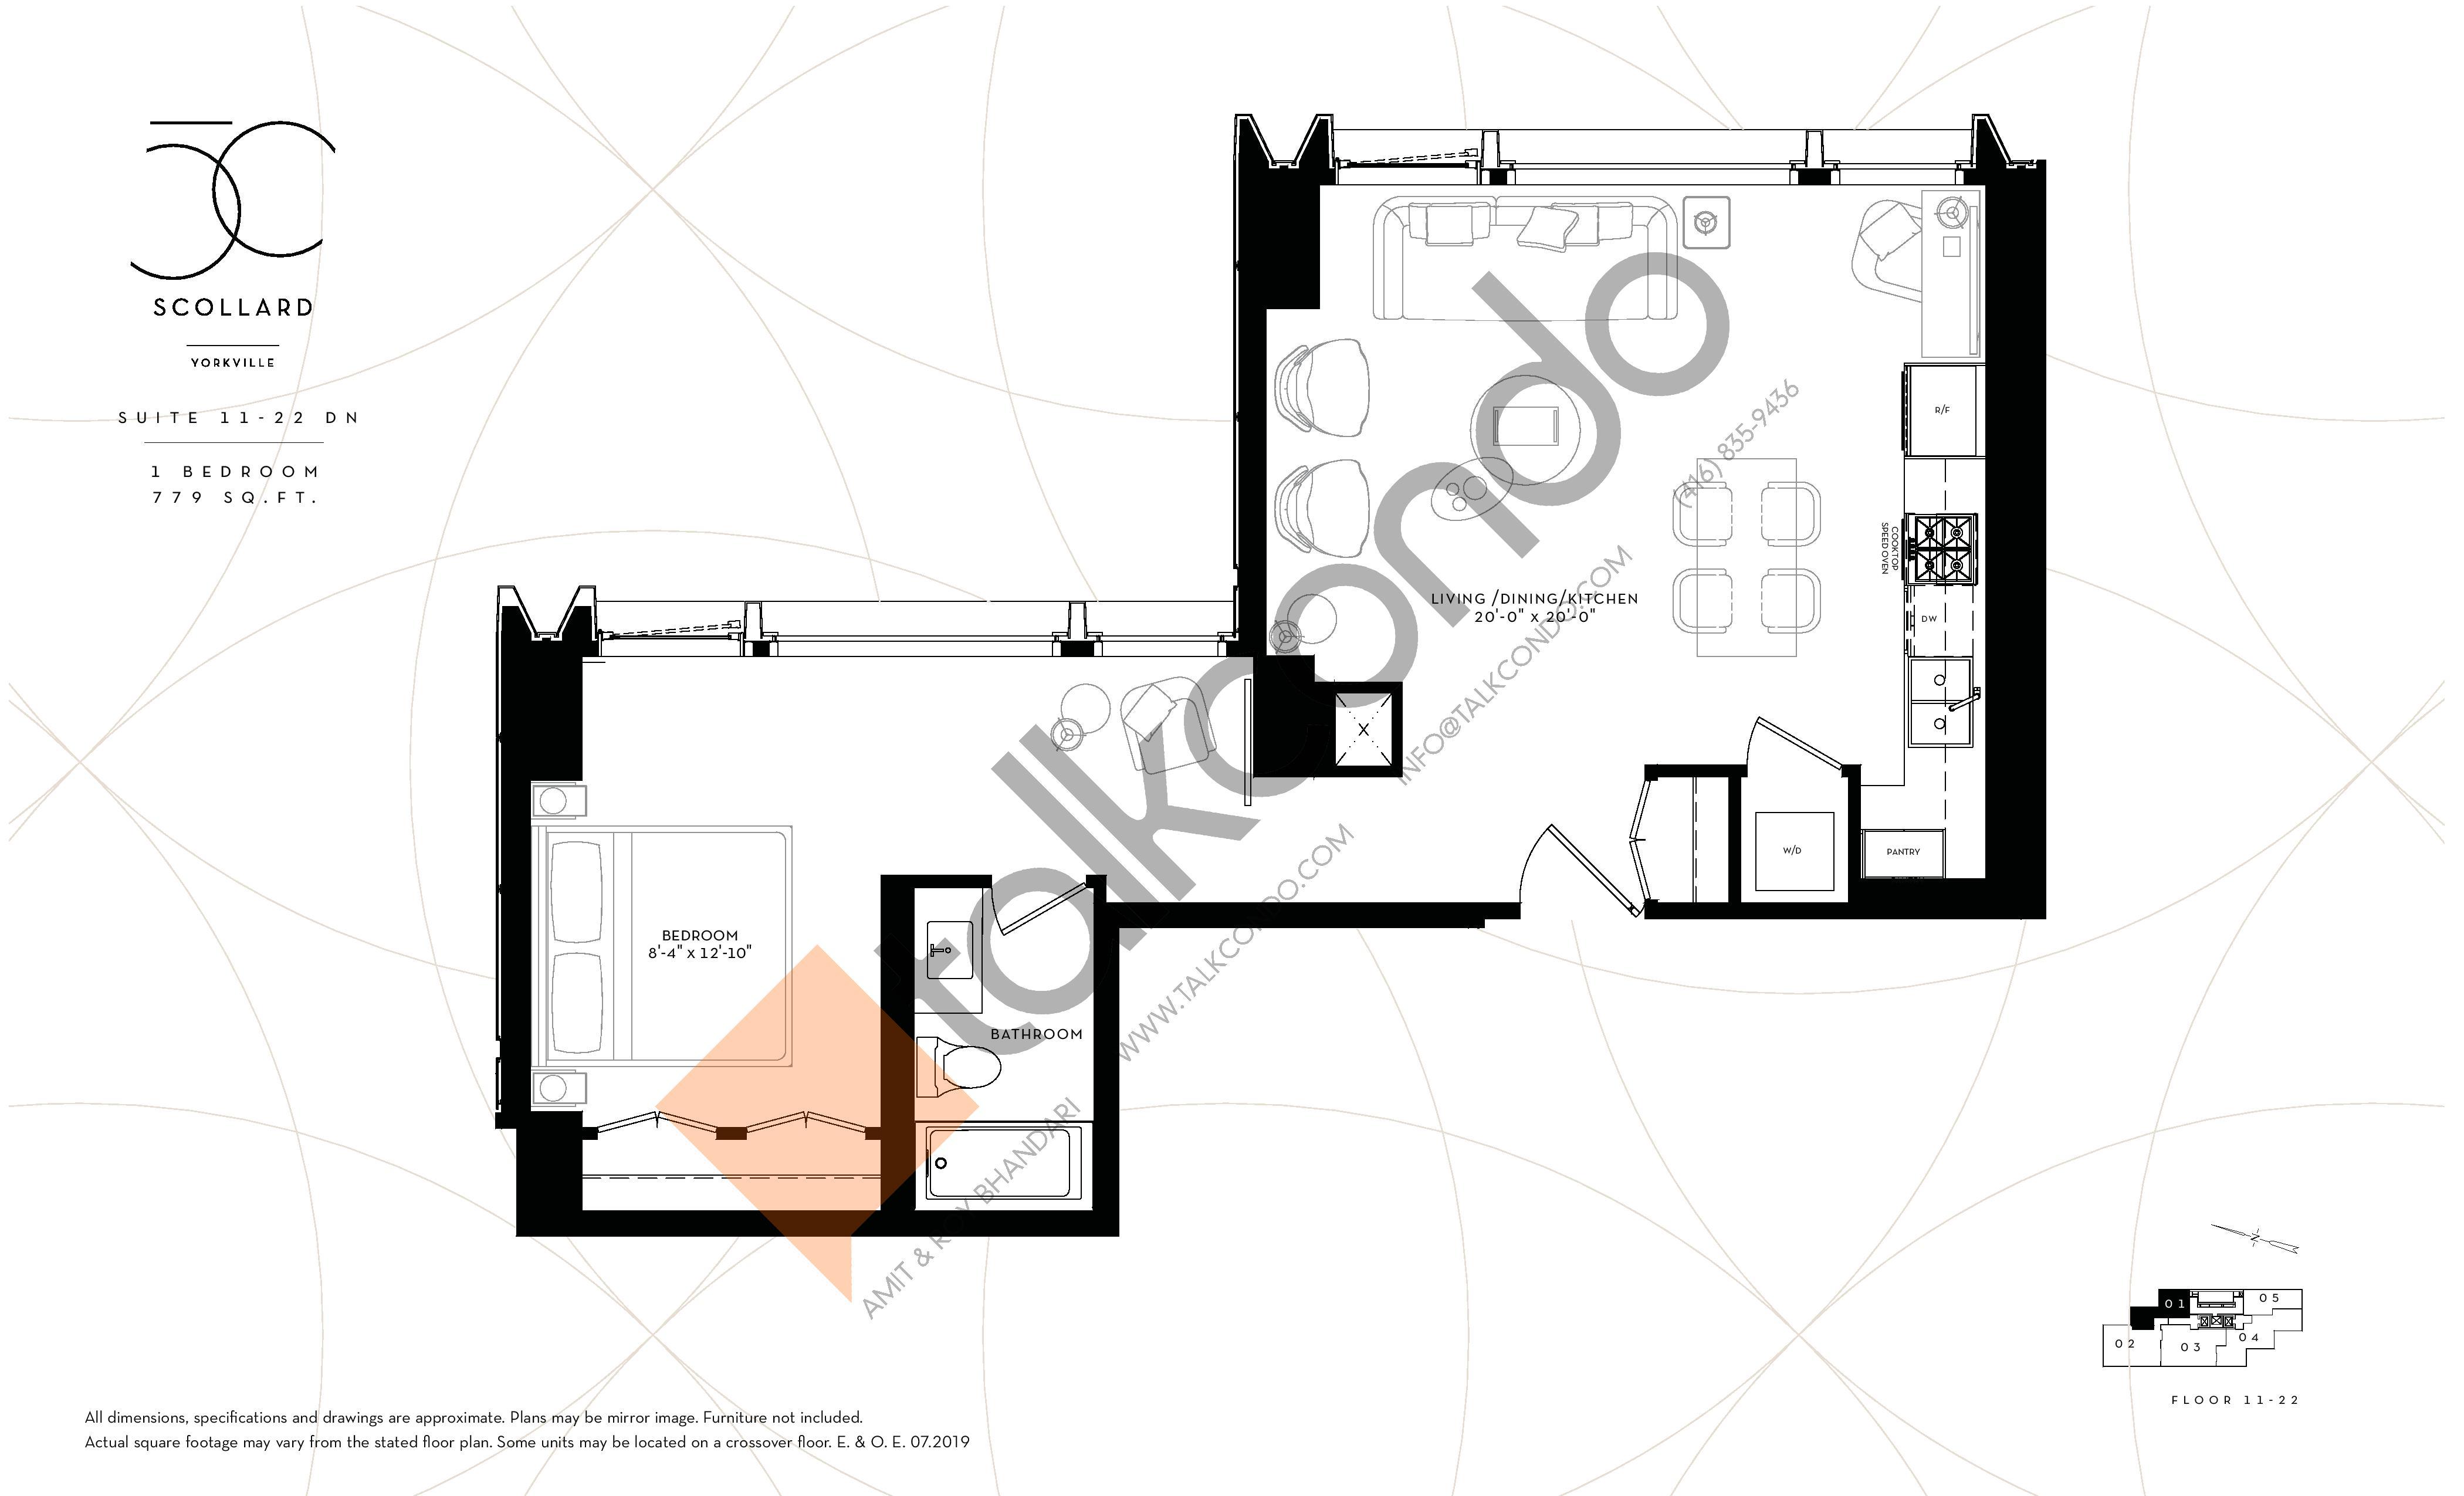 Suite 11-22 DN Floor Plan at Fifty Scollard Condos - 779 sq.ft